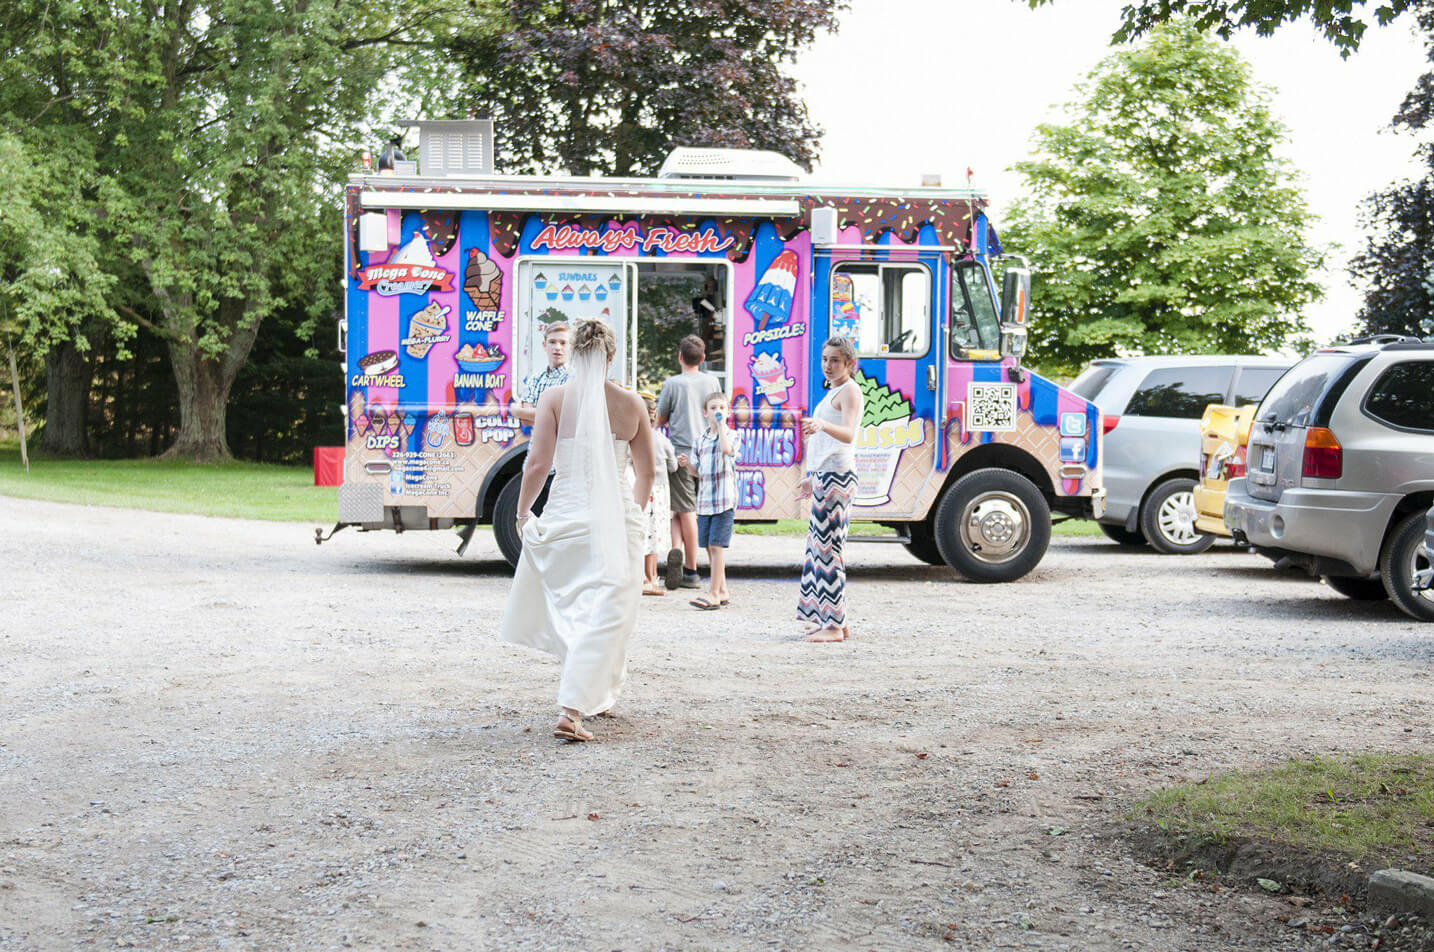 Mega Cone Creamery: Kitchener Event Catering - Rent Ice Cream Trucks